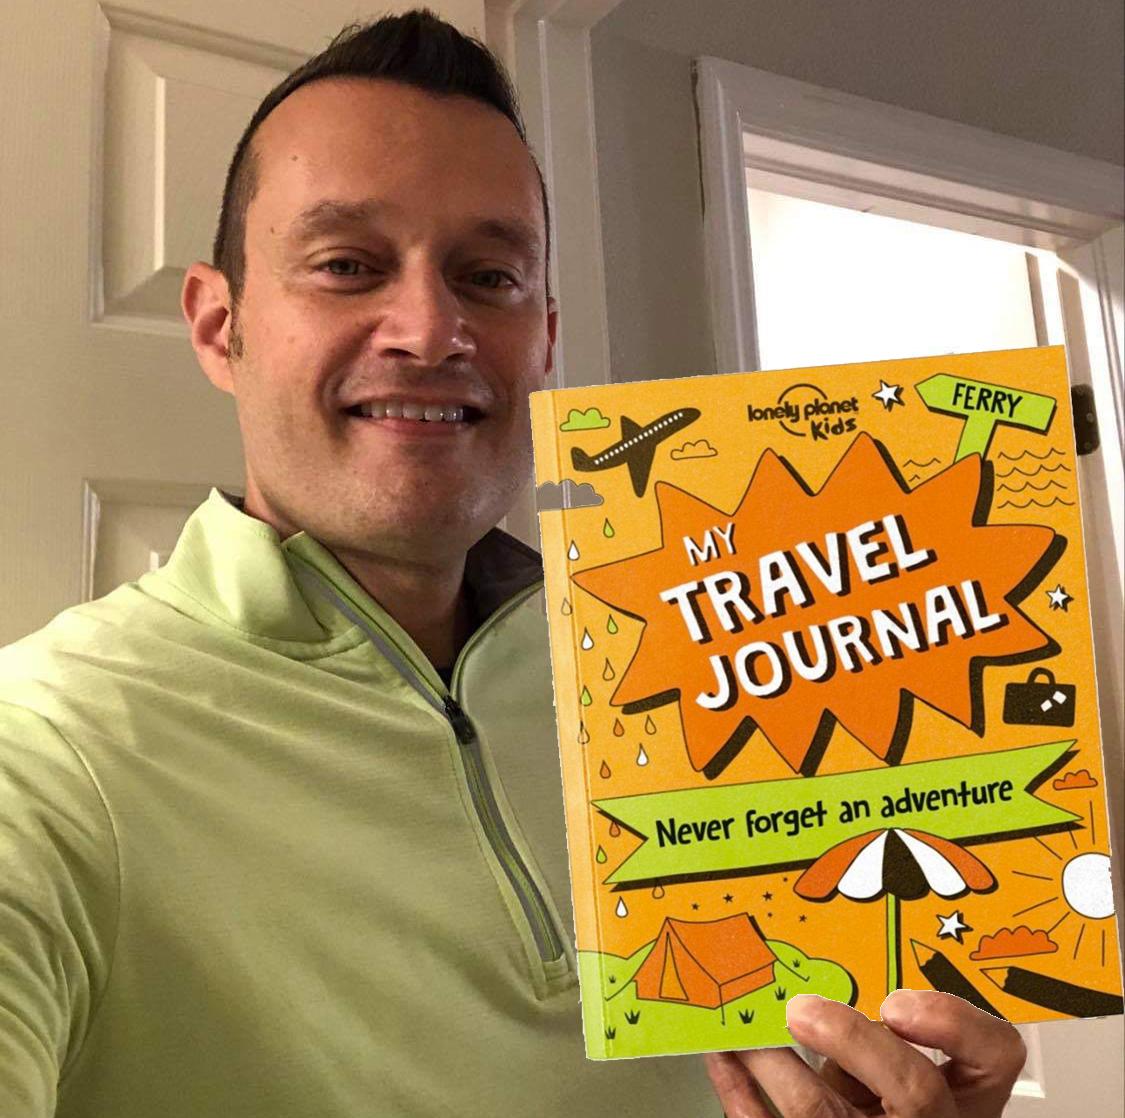 Josh Vignona #bleisure travel journal